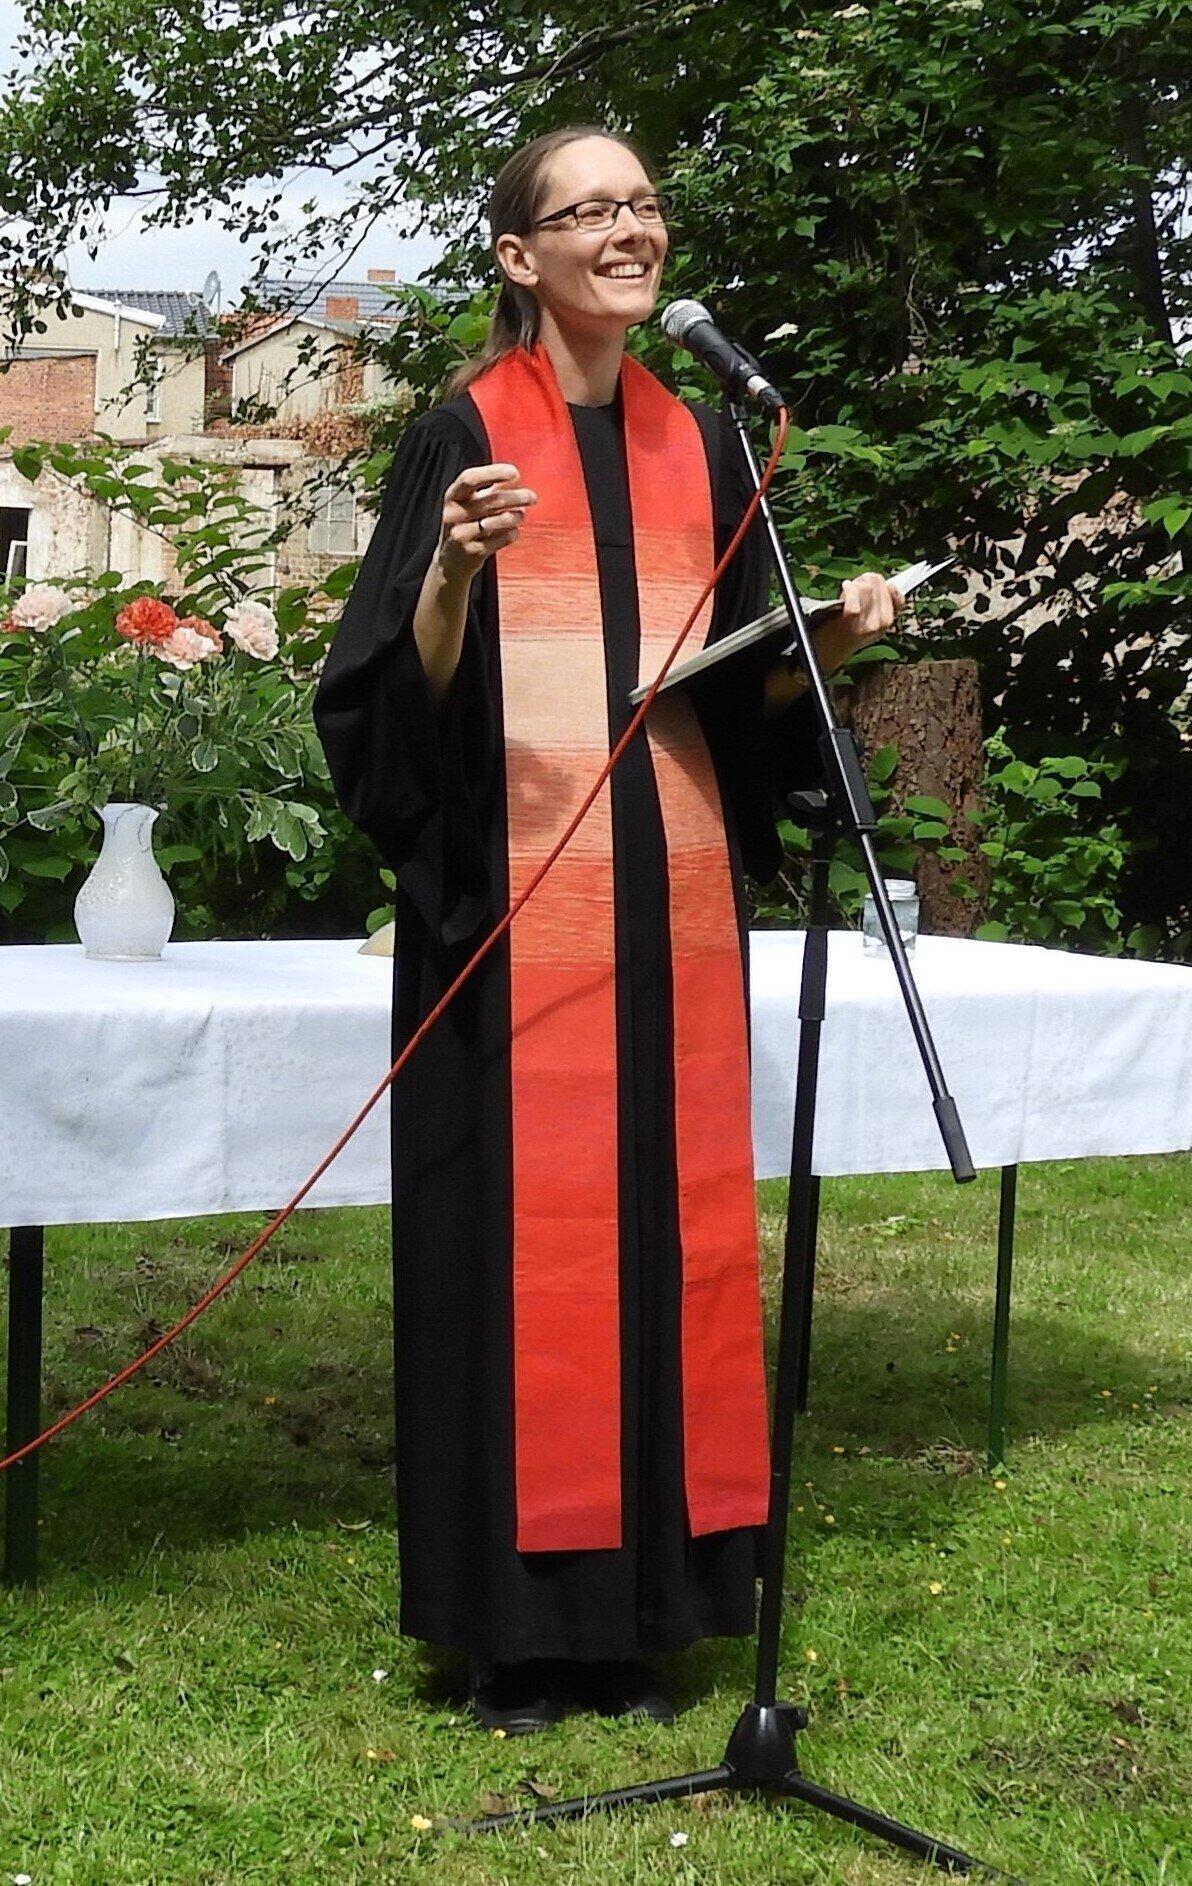 Pfarrerin Verena Mittermaier